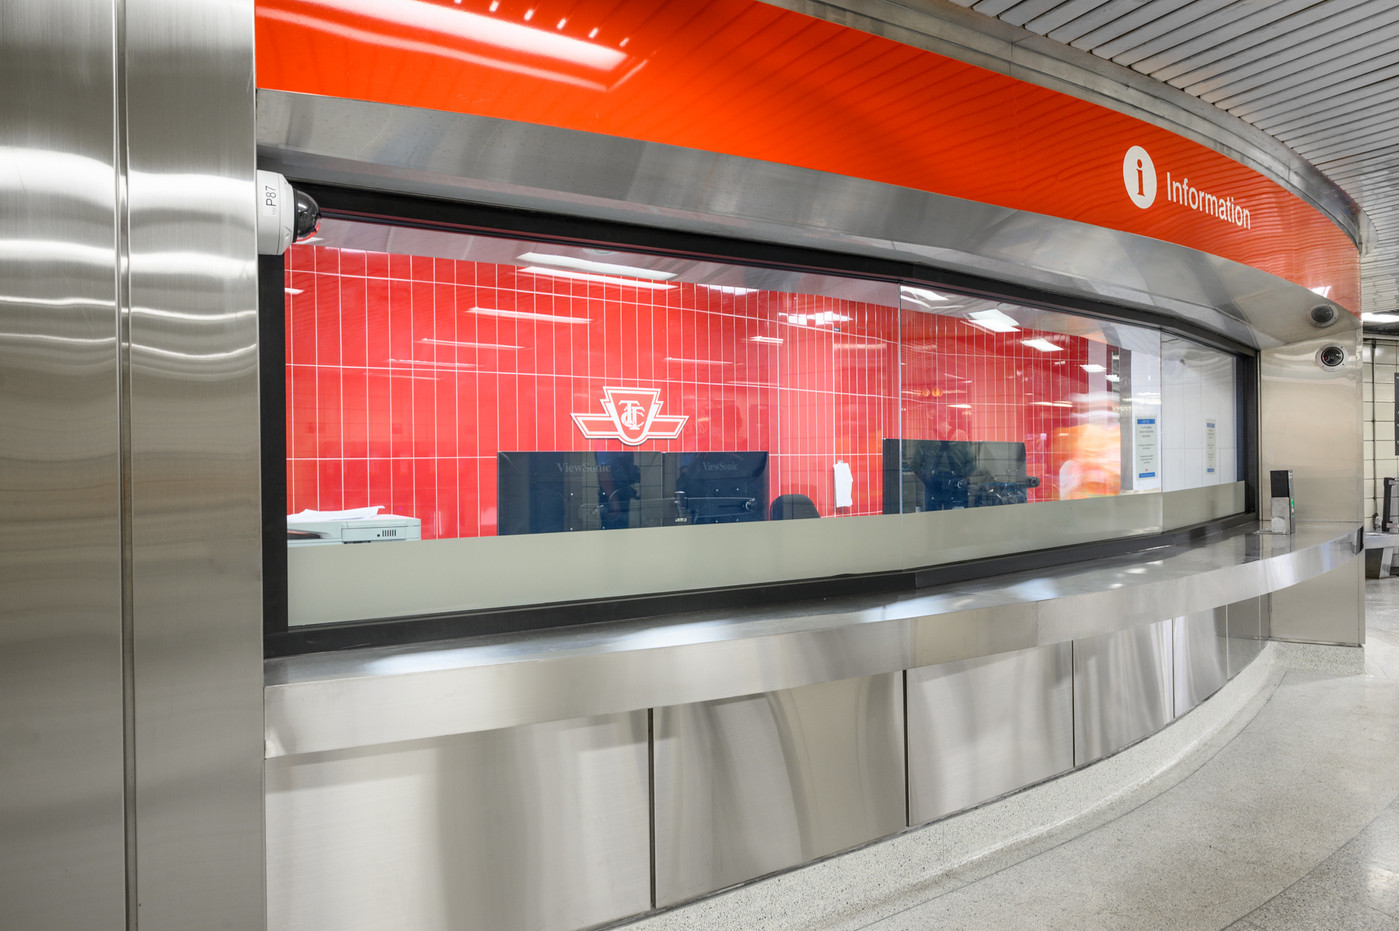 TTC Info Station